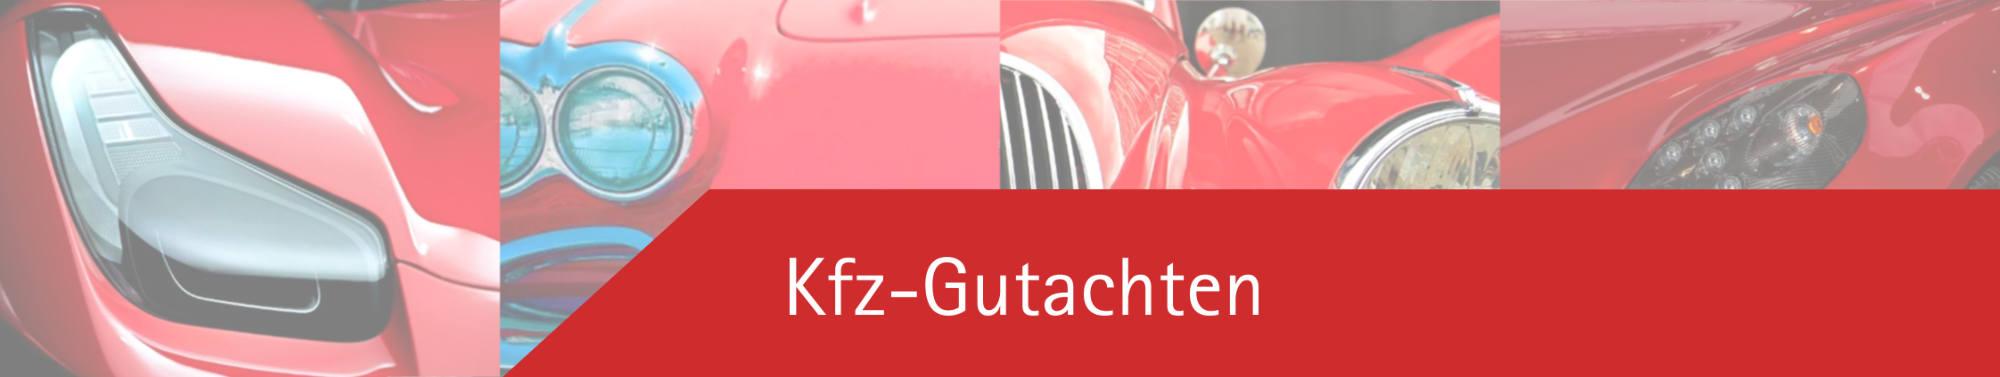 KFZ Oldtimer Gutachten Härtner Ingenieurbüro